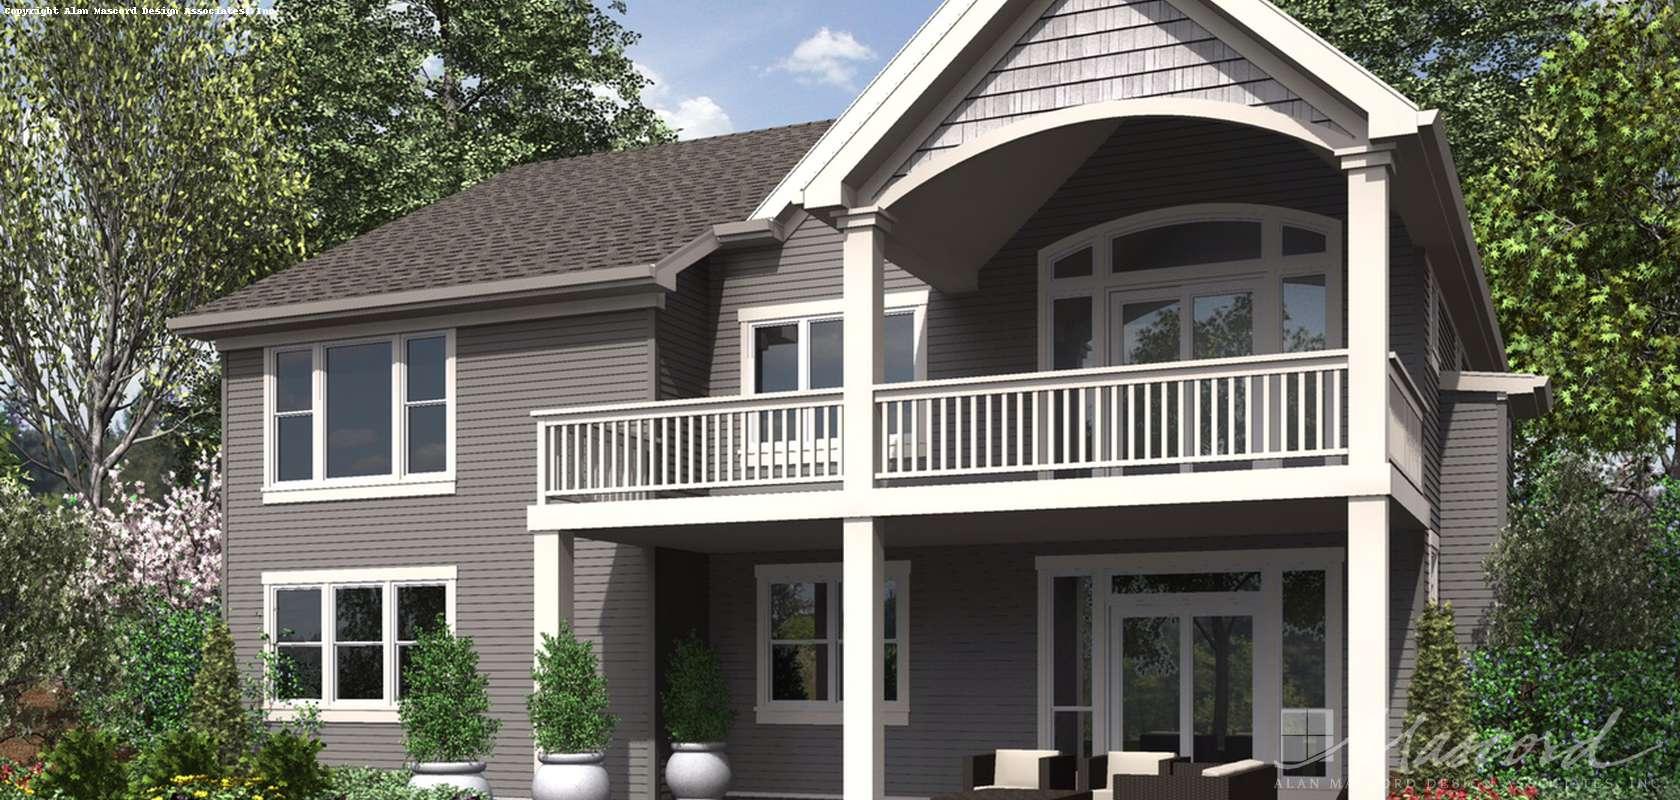 Mascord House Plan 1253: The Alamosa